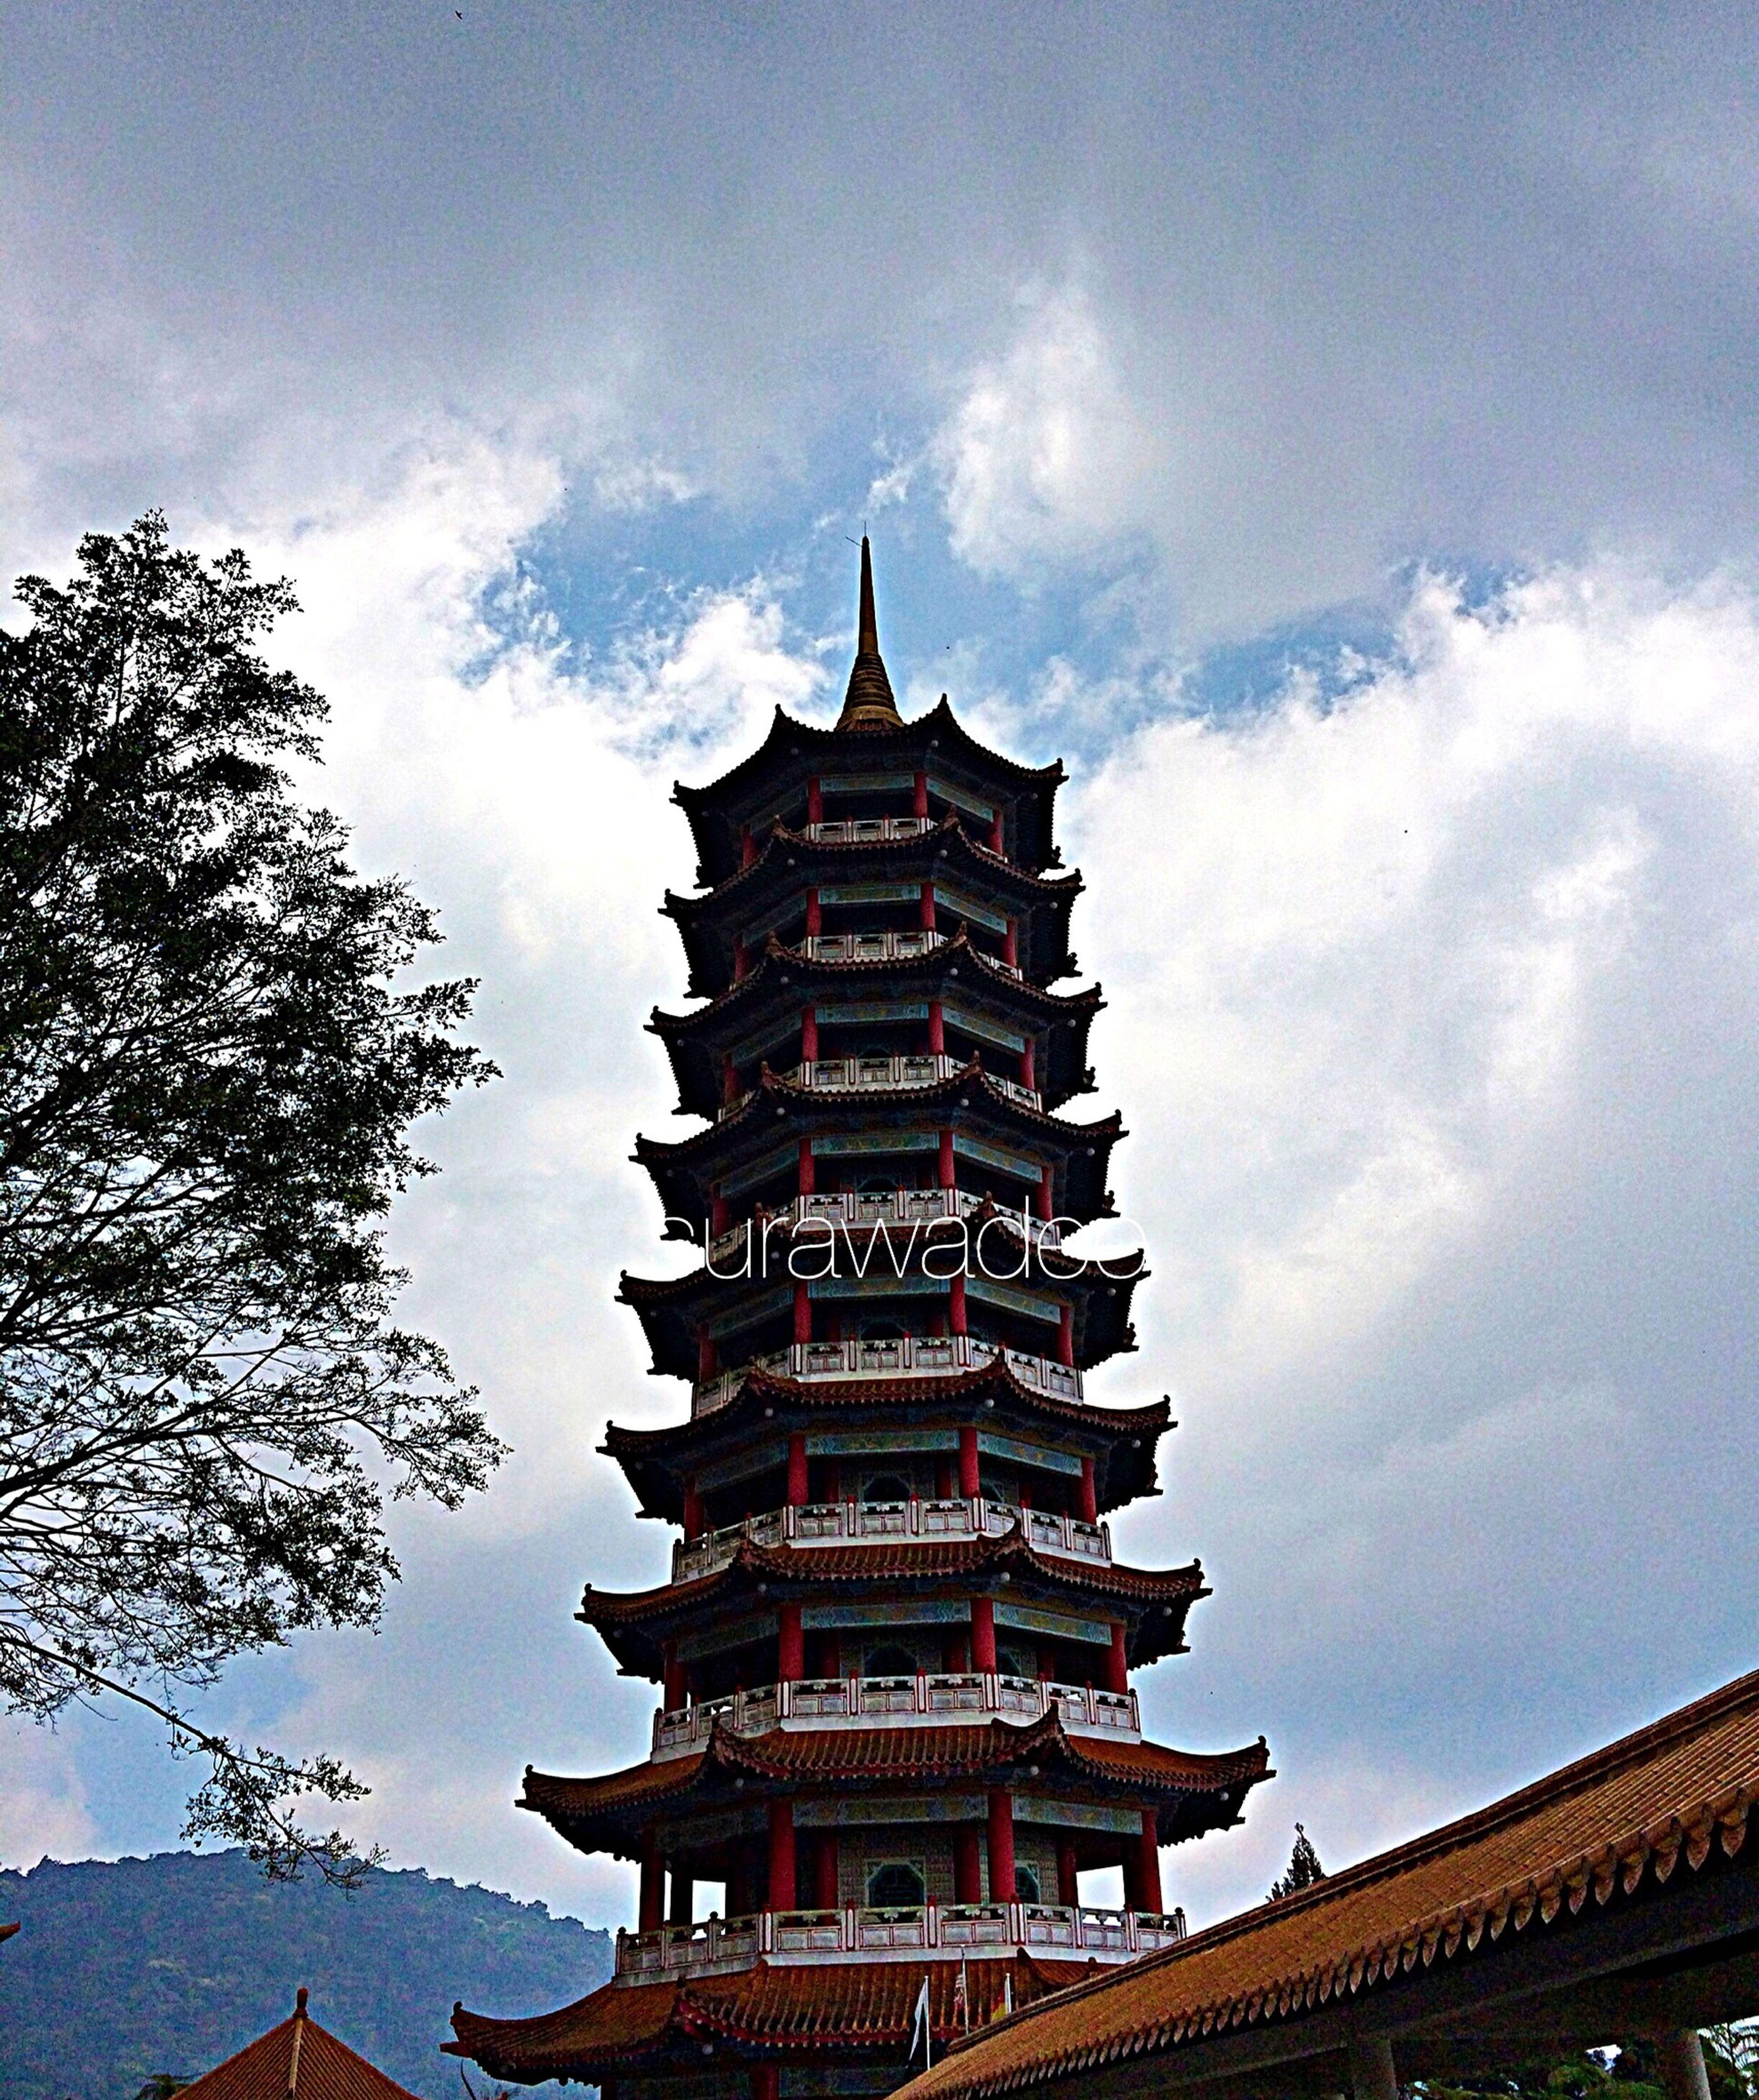 architecture, built structure, building exterior, sky, famous place, temple - building, religion, place of worship, cloud - sky, low angle view, spirituality, travel destinations, tourism, history, temple, travel, cultures, cloud, pagoda